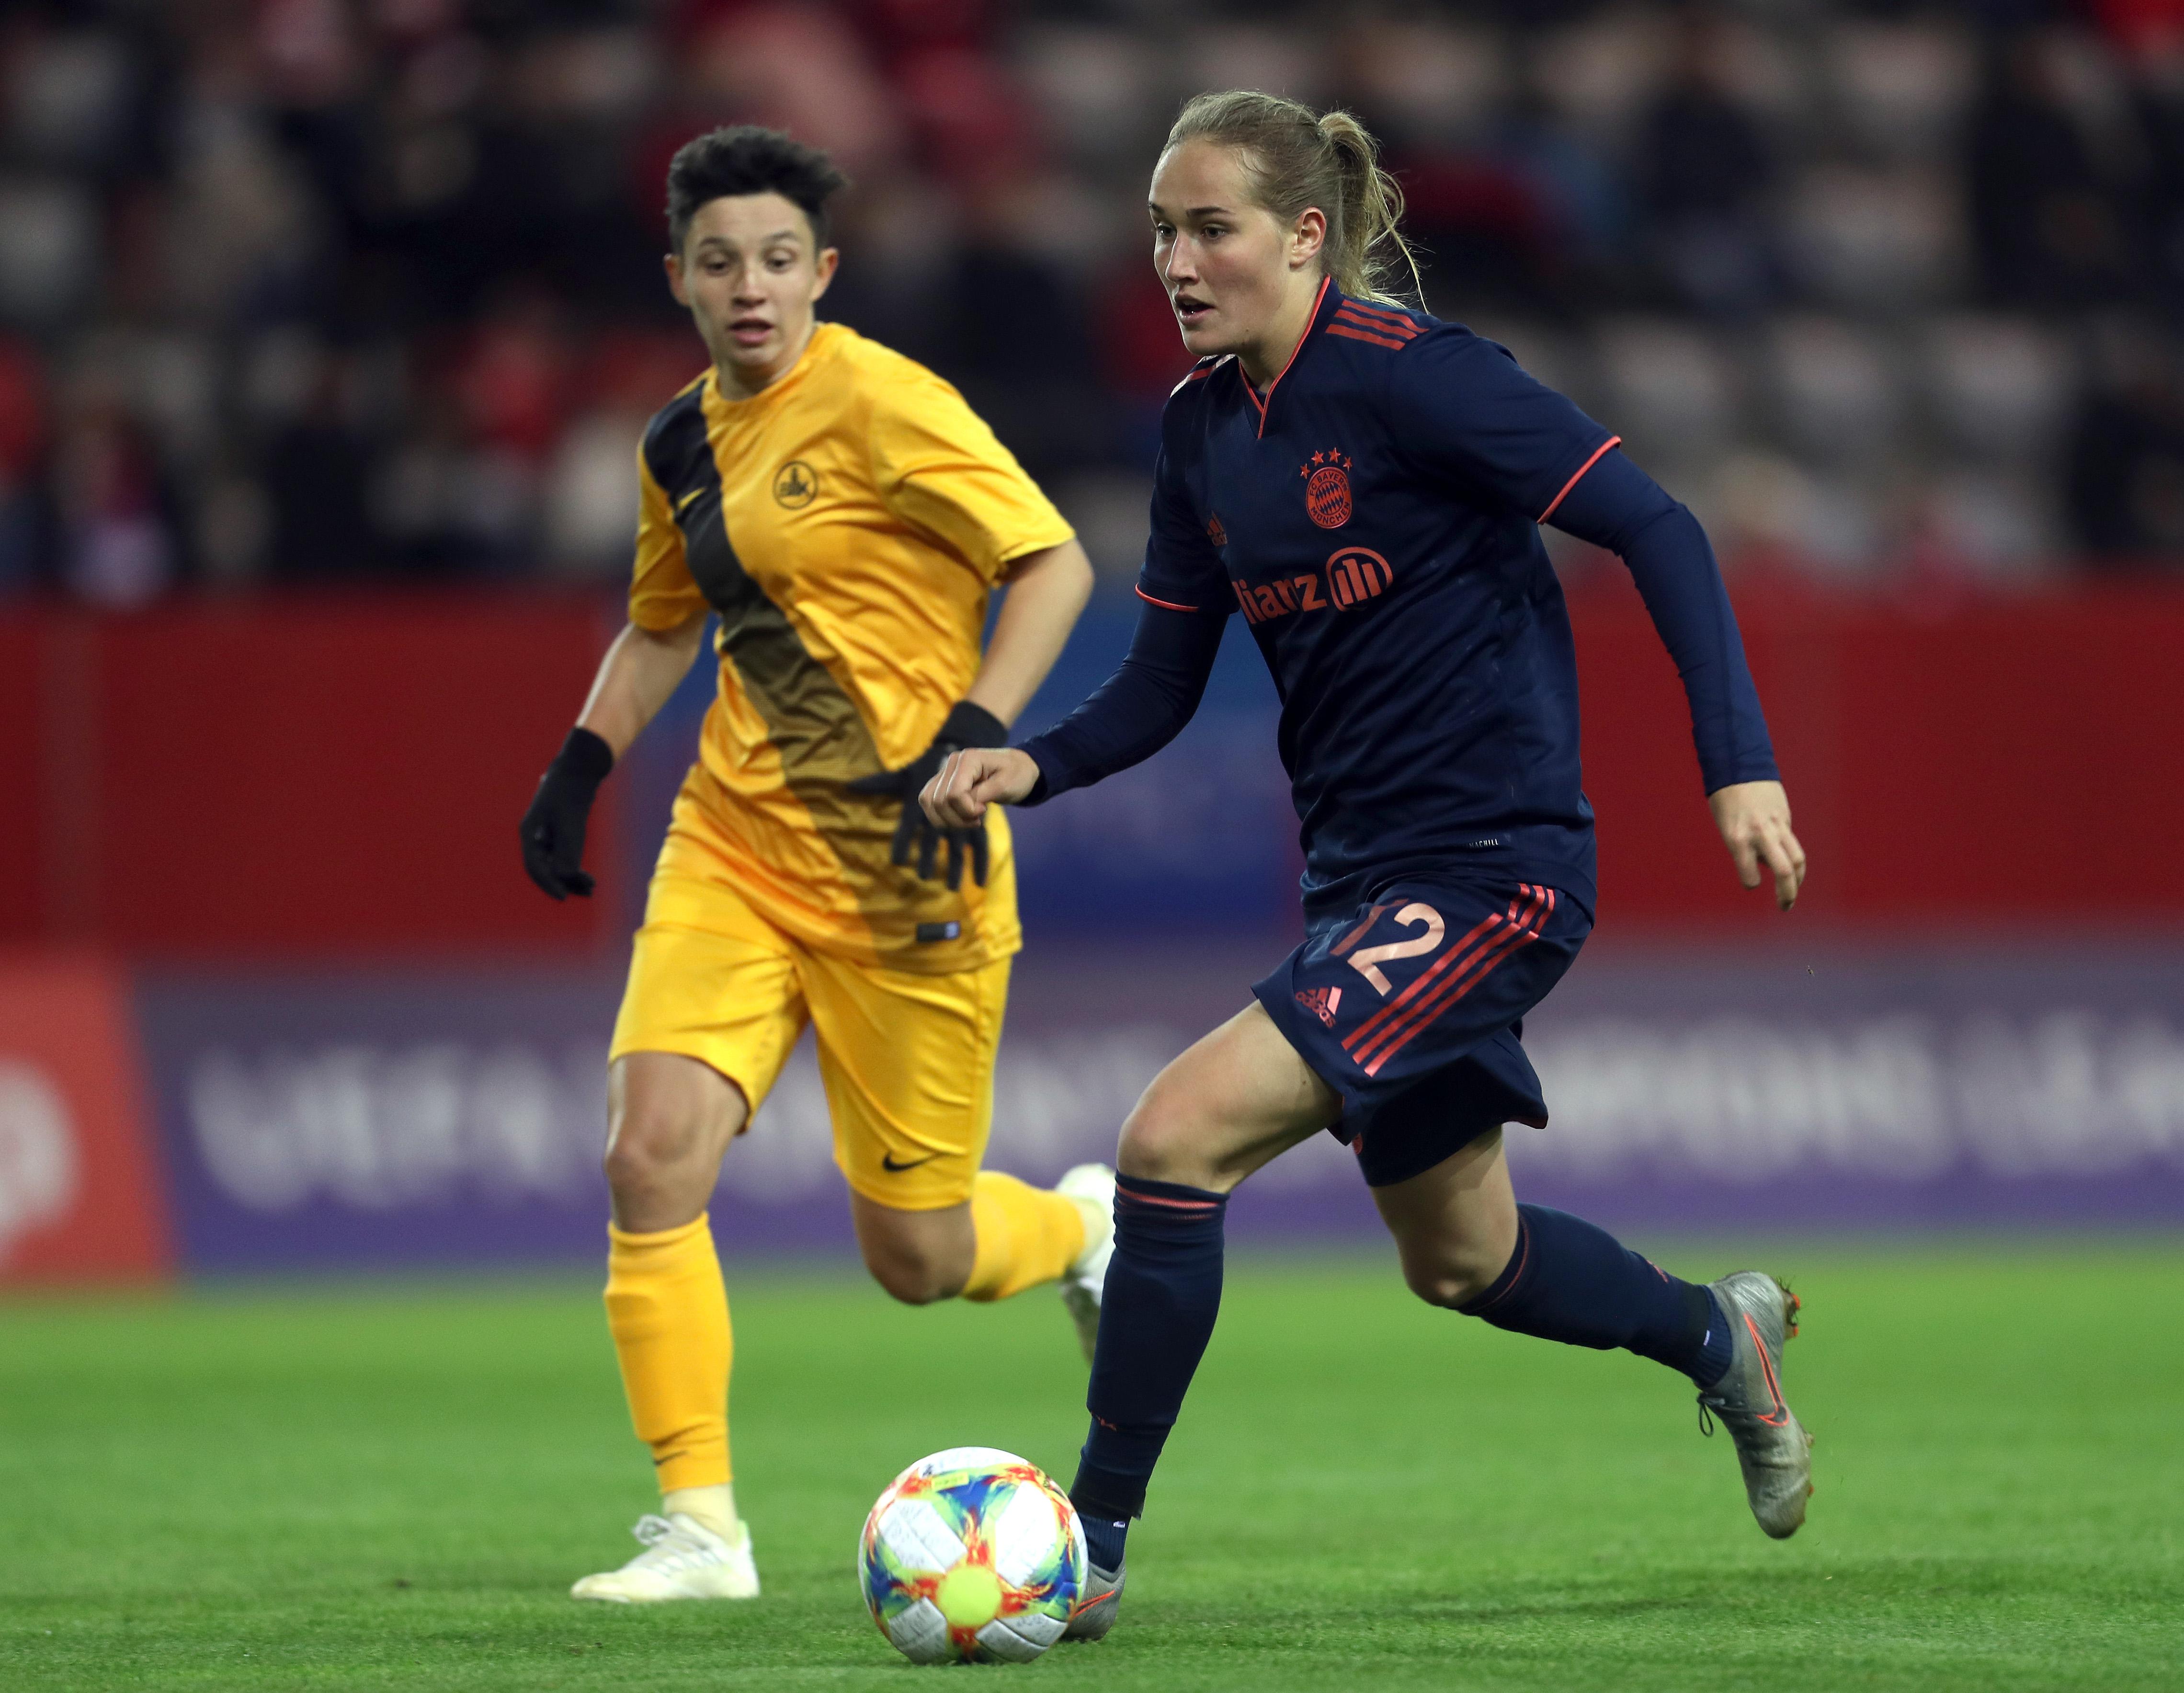 FC Bayern Muenchen Women's v BIIK Kazygurt - UEFA Women's Champions League